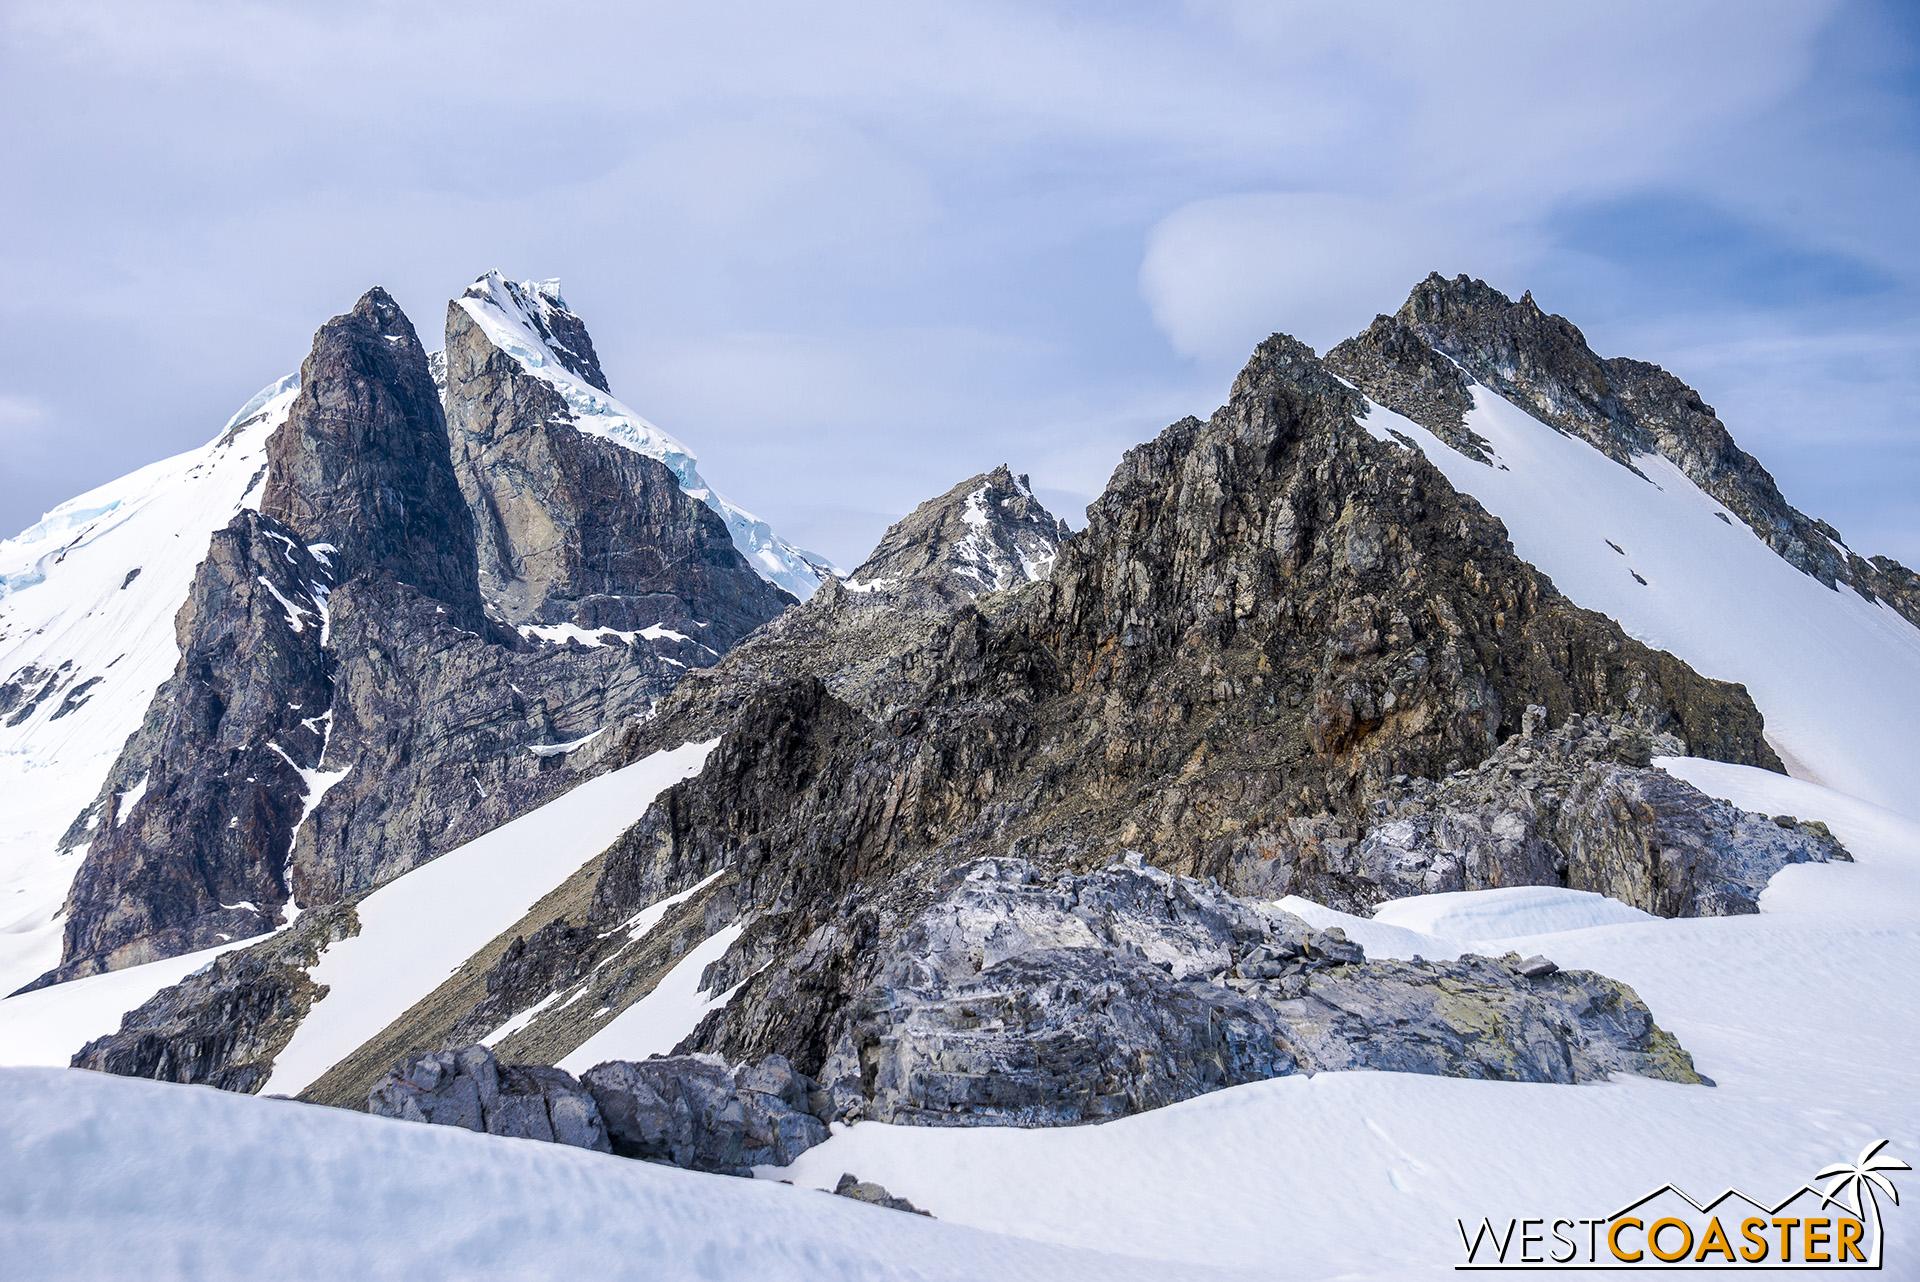 The dramatic peaks of the Antarctic peninsula!